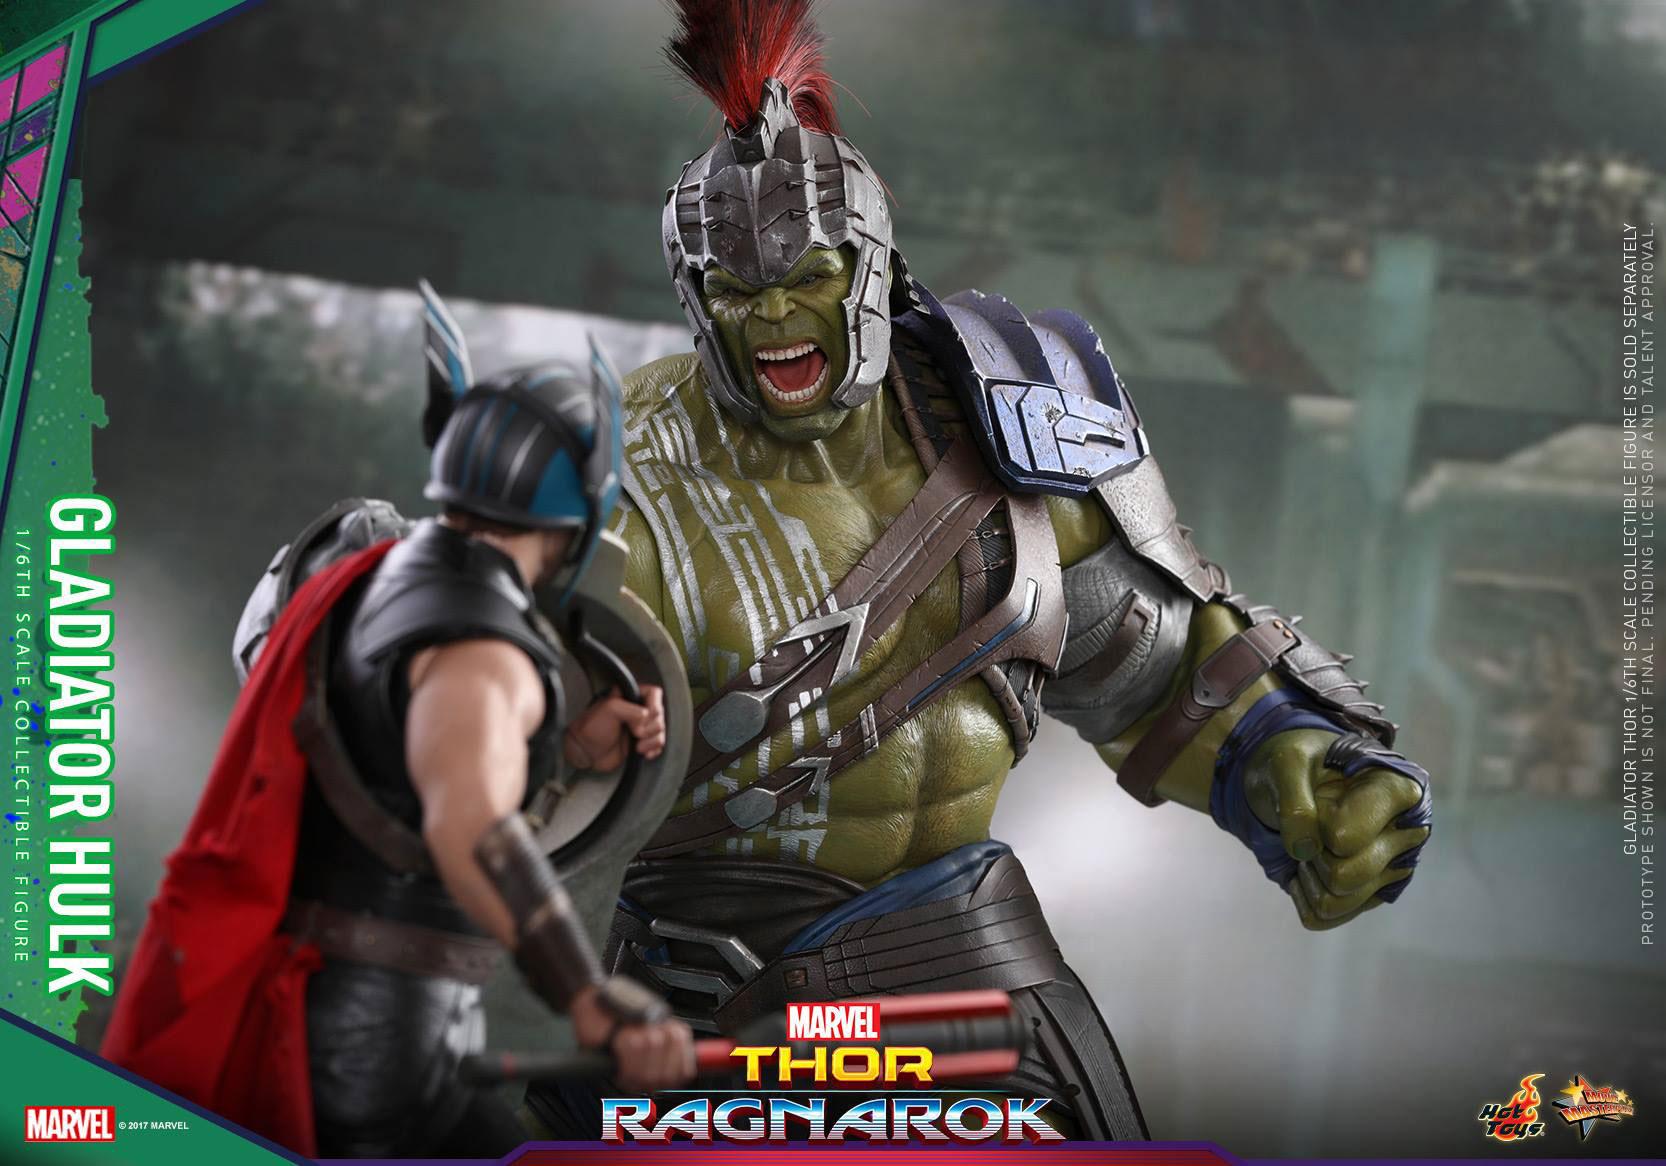 thor-ragnarok-gladiator-hulk-hot-toys-figure-6